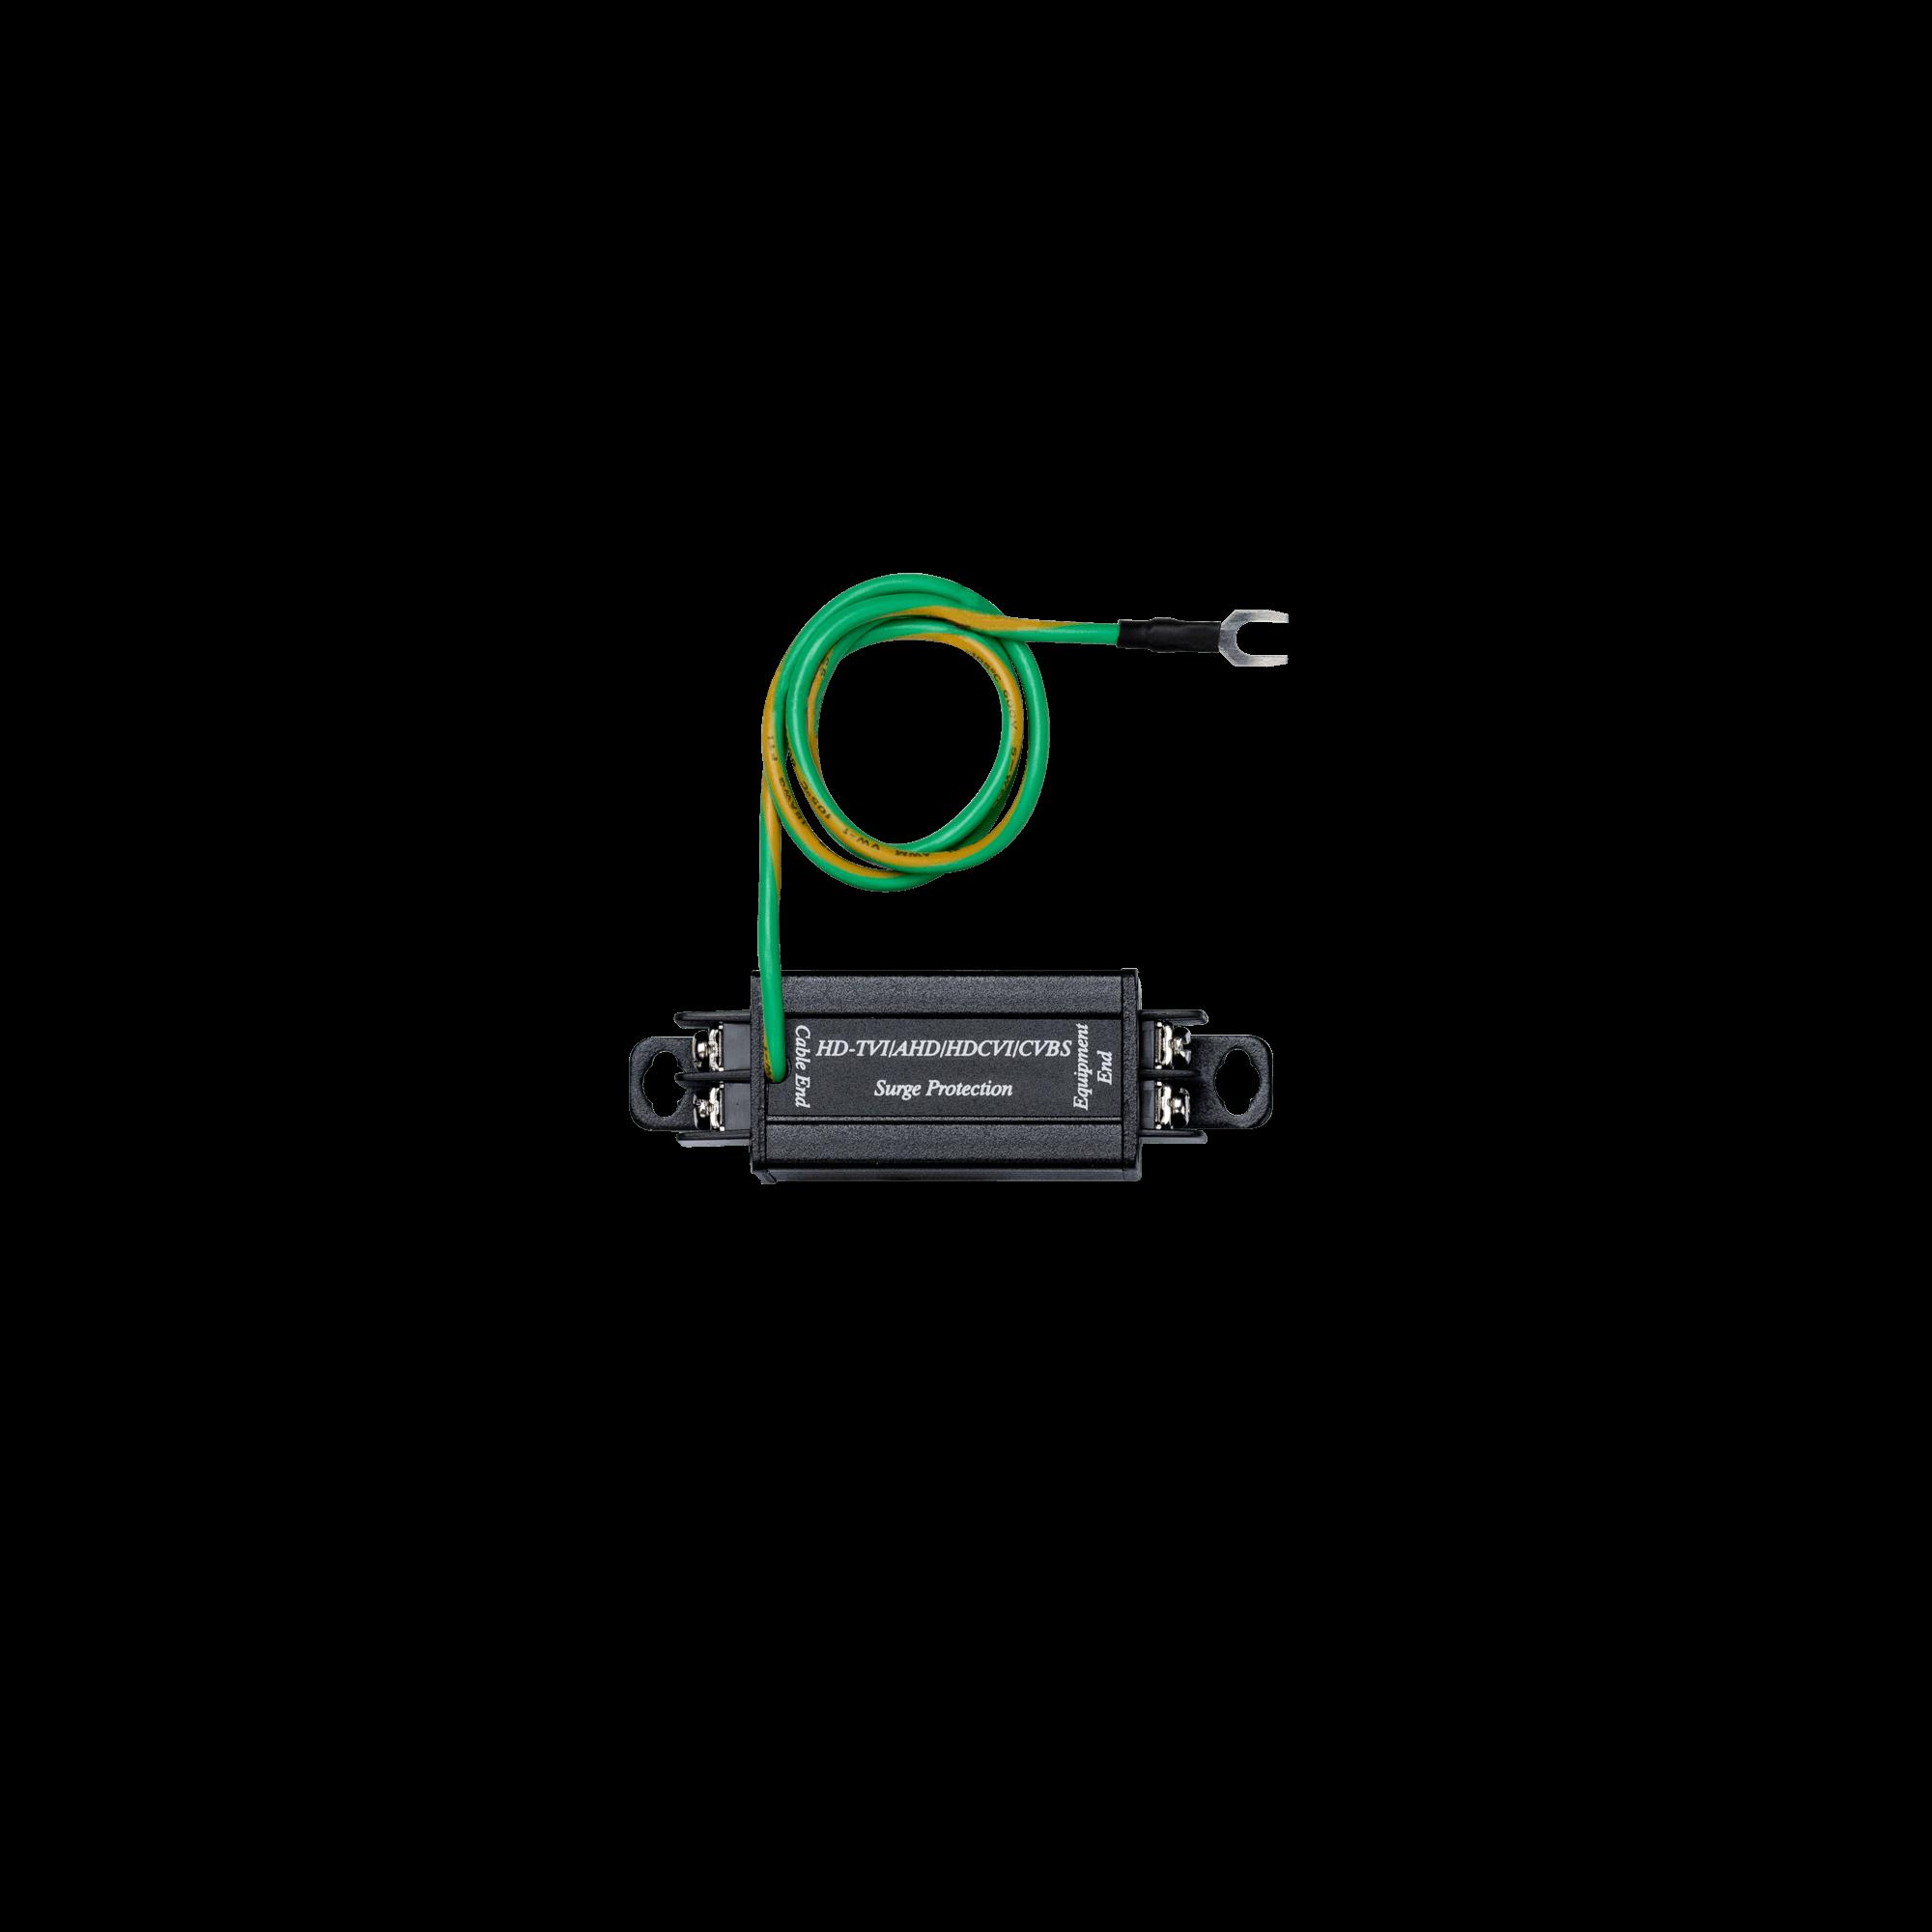 UTP HD-TVI/AHD/HDCVI/CVBS  Surge Protector